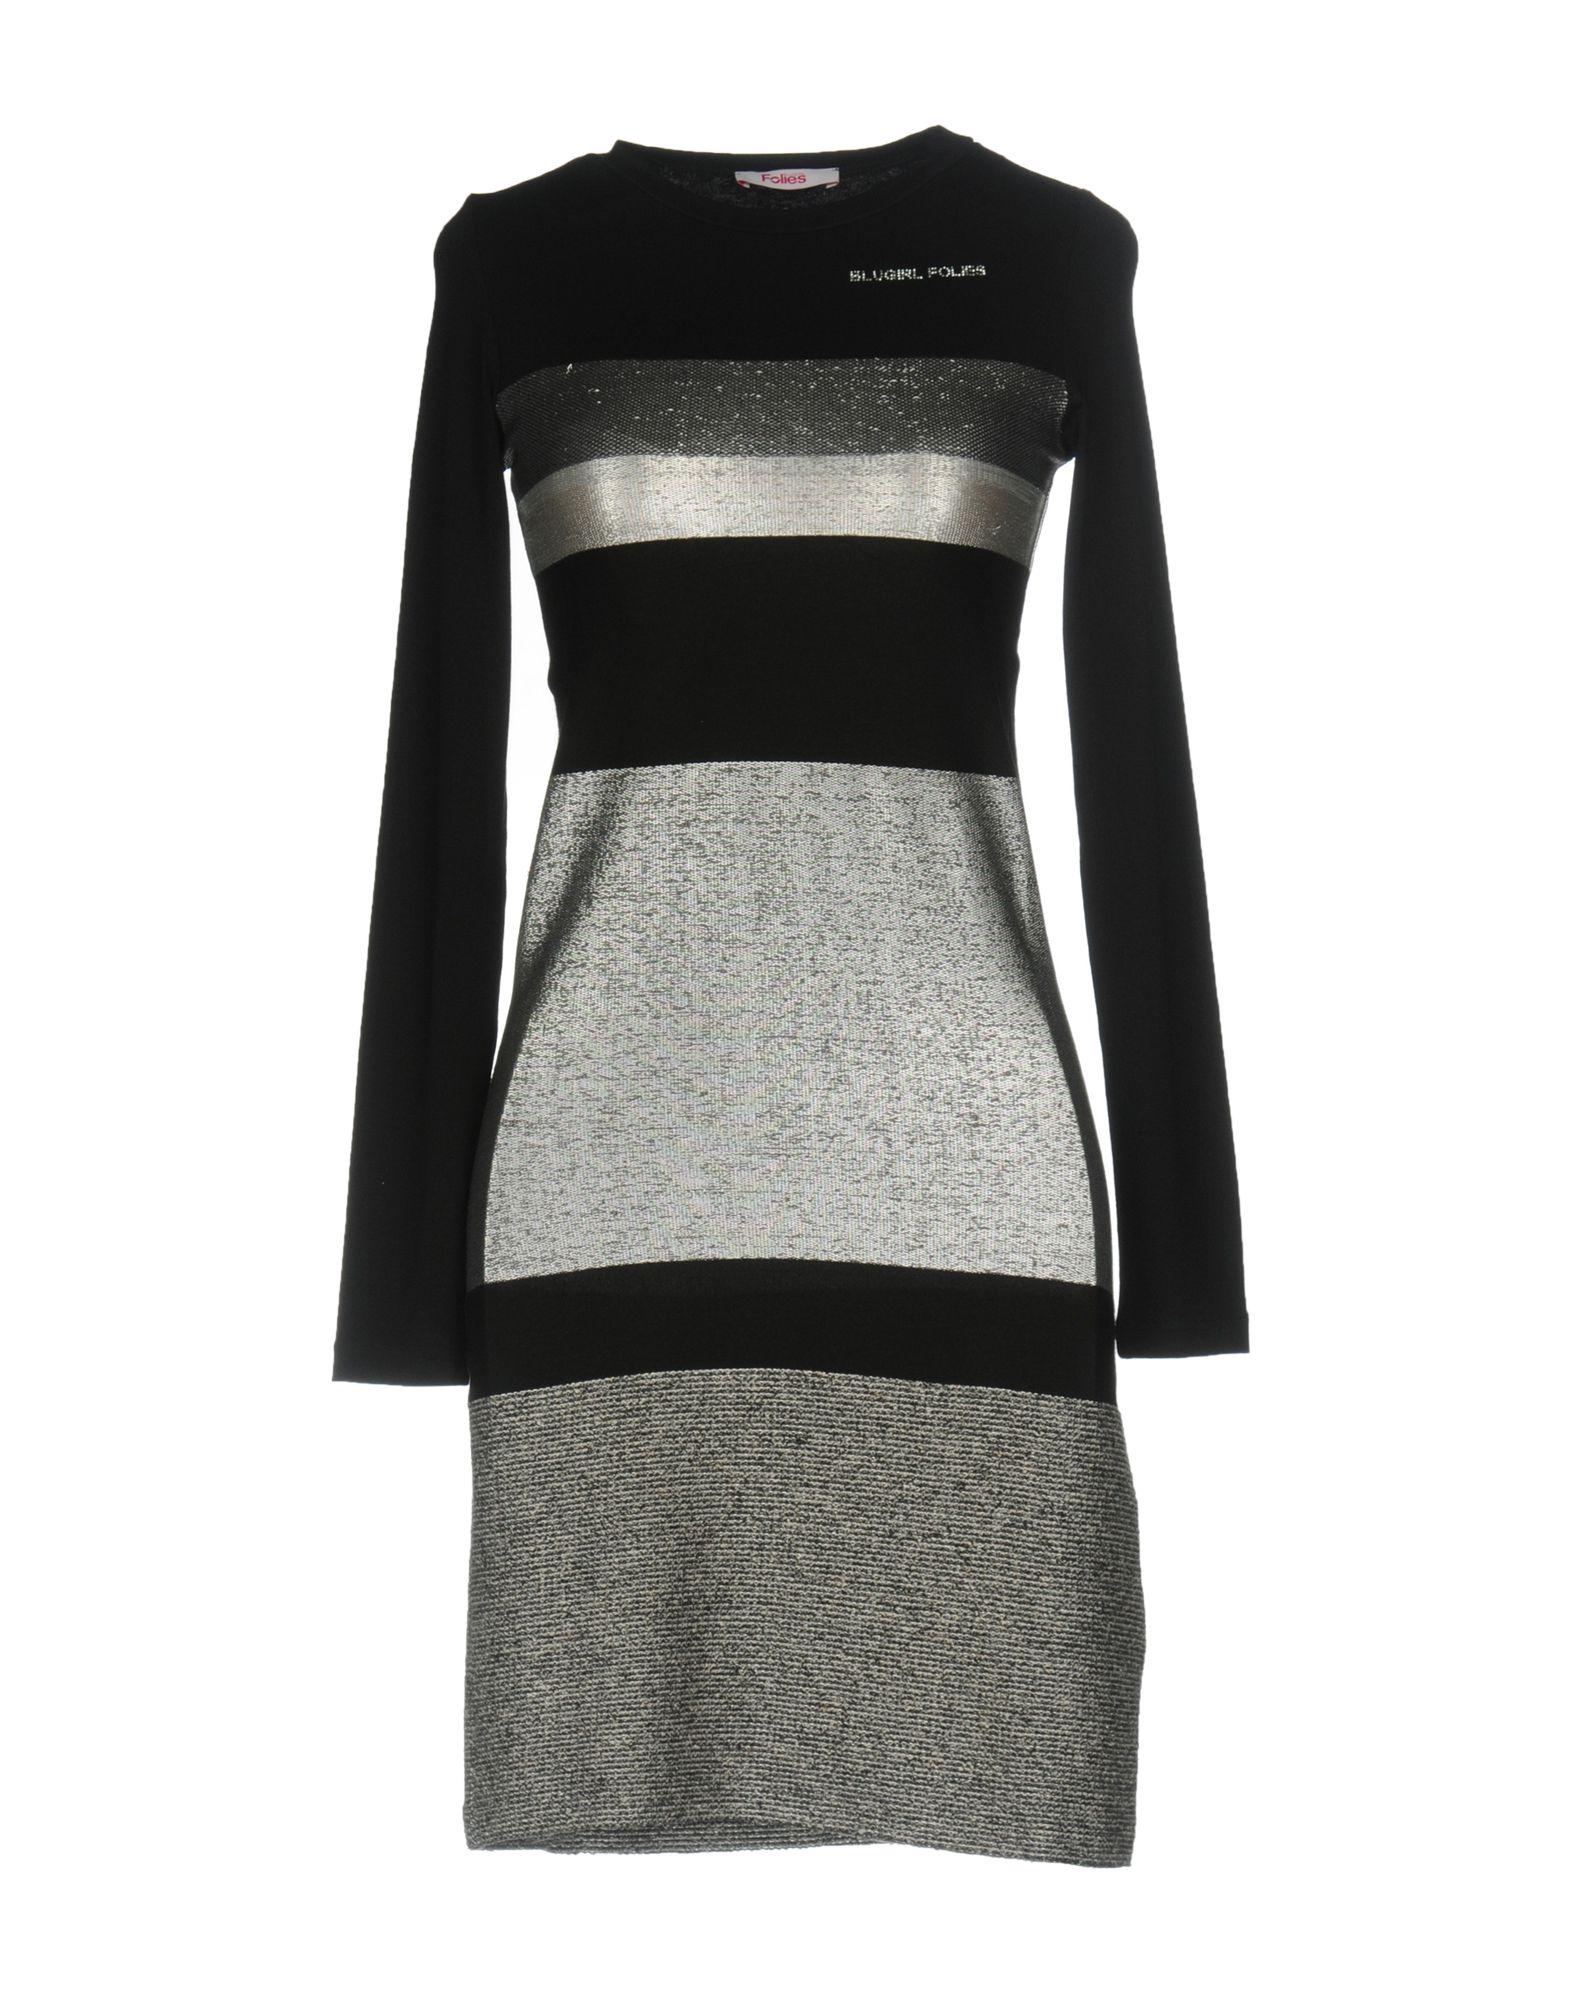 BLUGIRL FOLIES Короткое платье платье трикотаж blugirl folies платья и сарафаны мини короткие